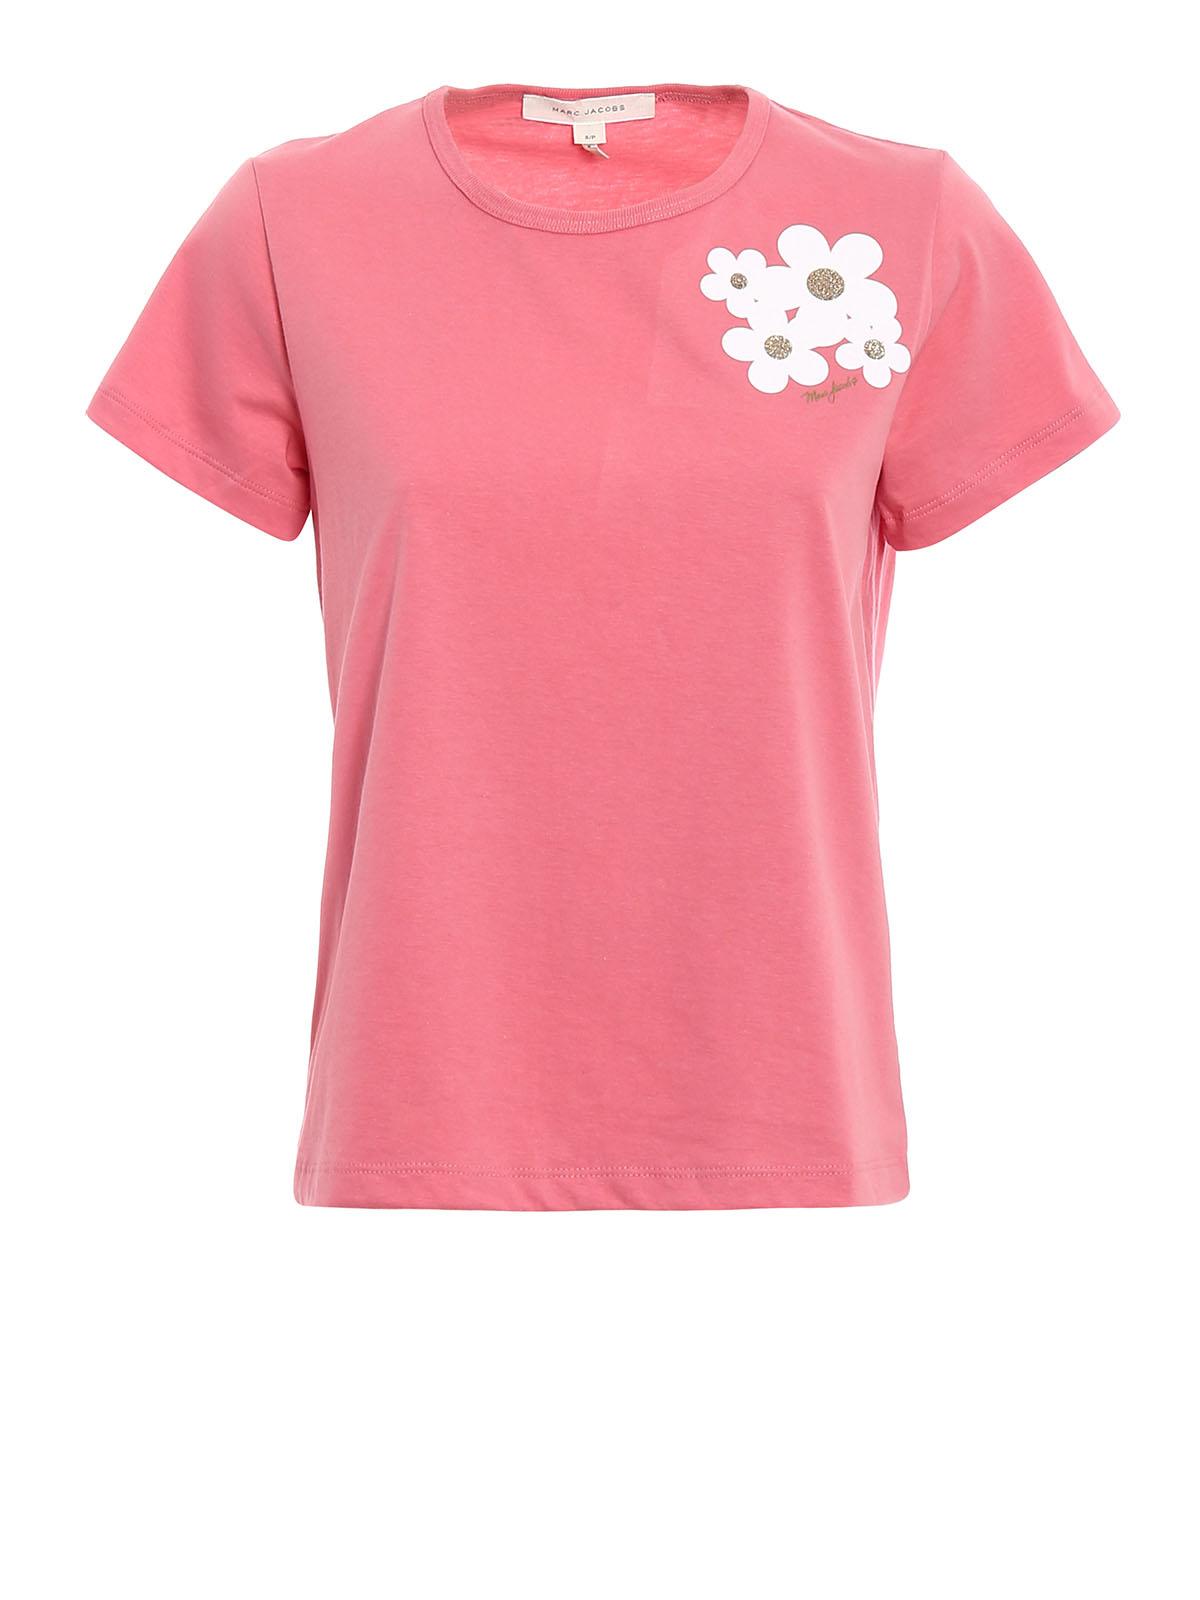 c78436dd4108d4 Marc Jacobs - T-Shirt - Daisy - T-shirts - M4006991 650   iKRIX.com